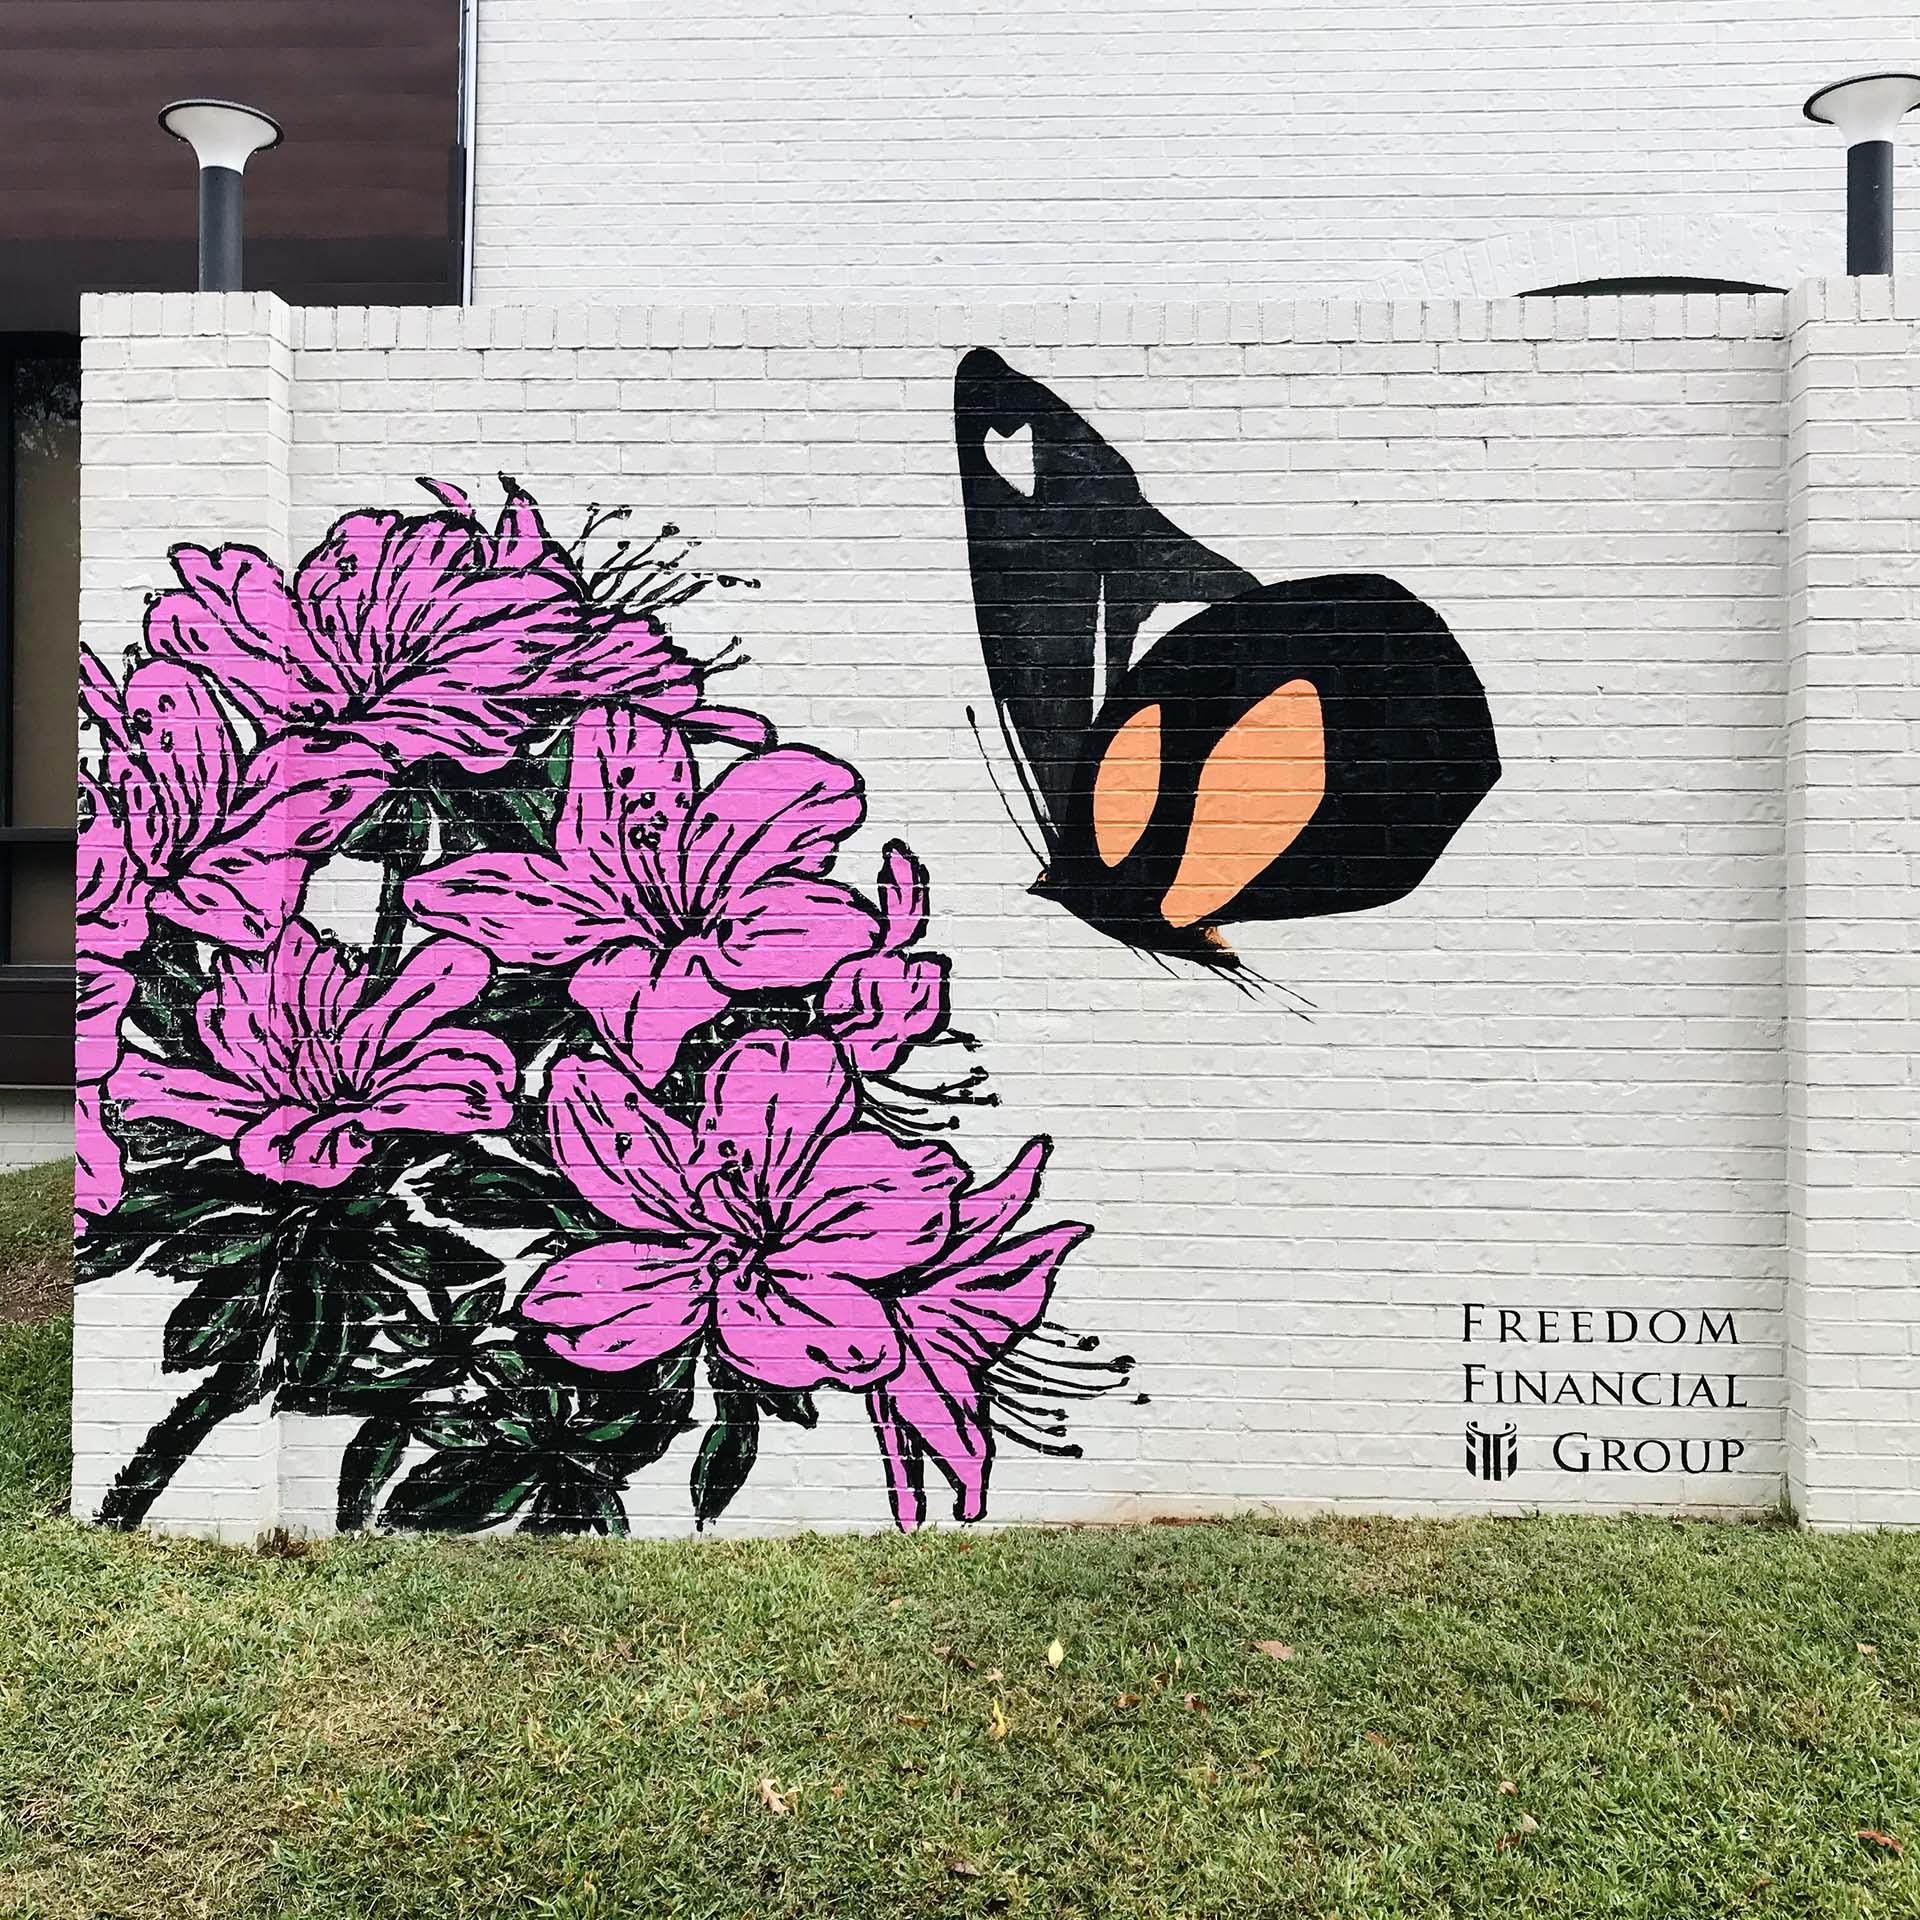 azalea mural - butterfly mural - custom mural - mural - Dace Kidd - Mural Artist Tx